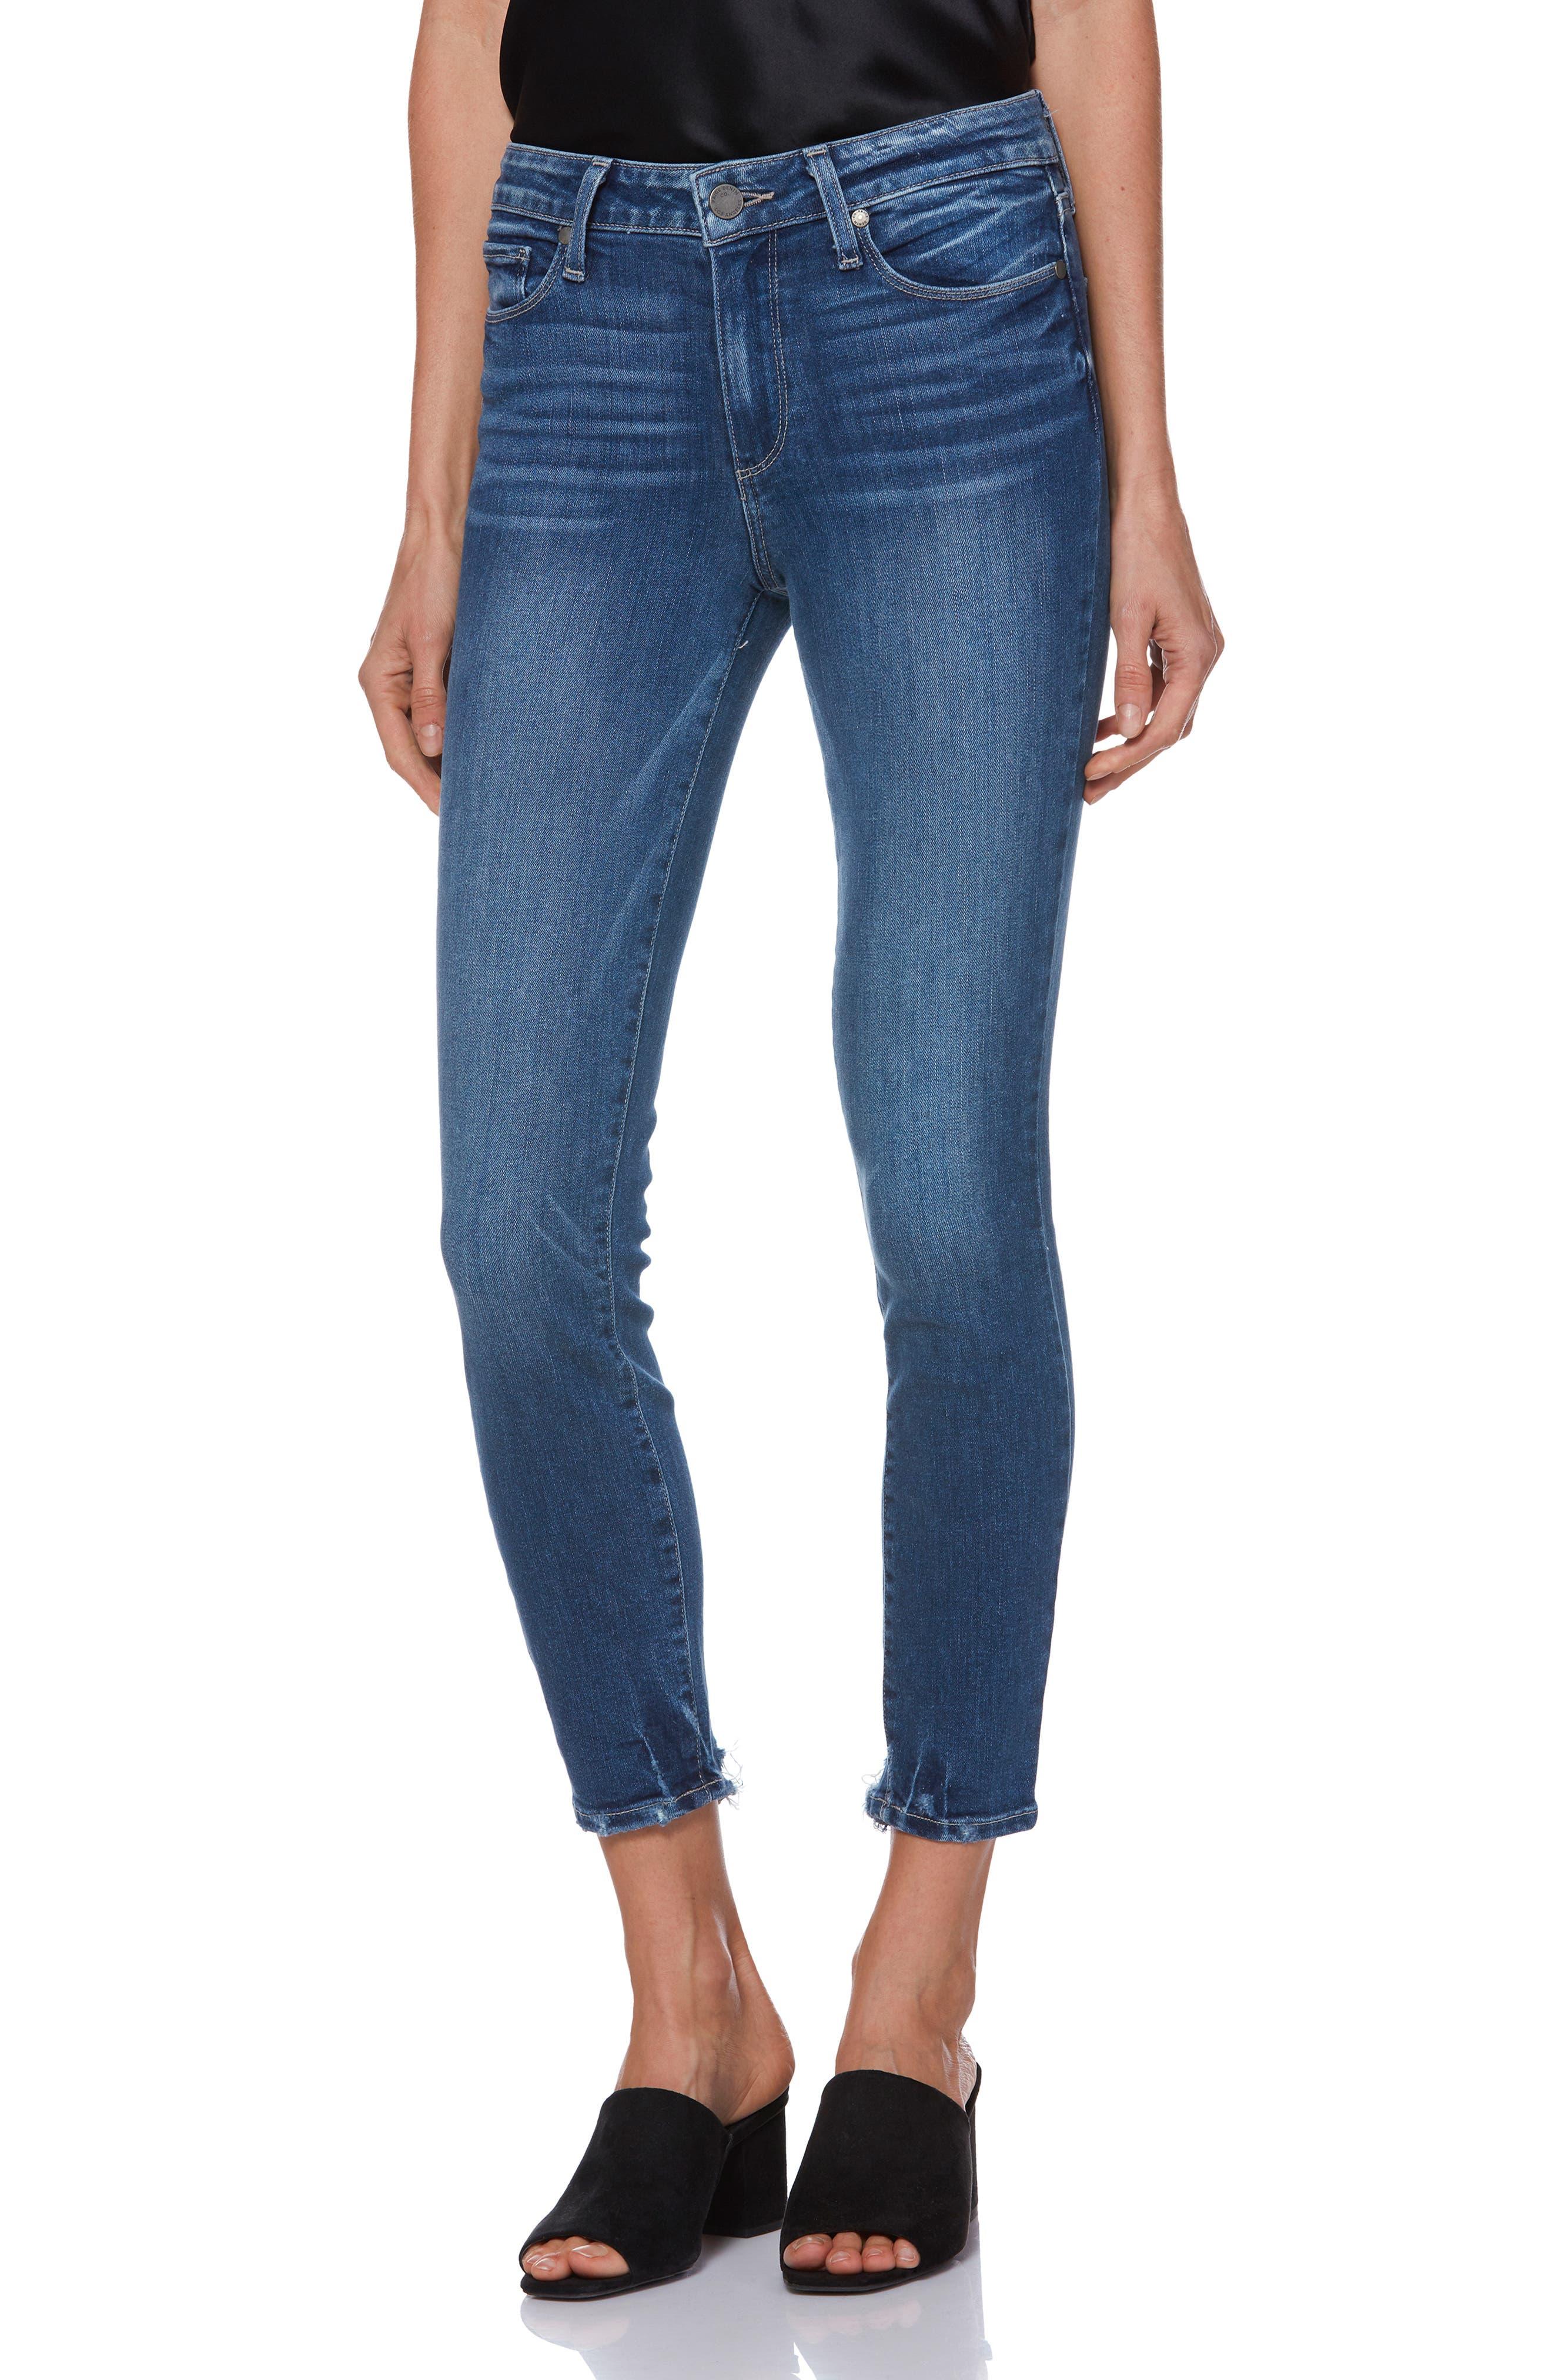 PAIGE Hoxton Transcend Vintage High Waist Crop Skinny Jeans, Main, color, 400